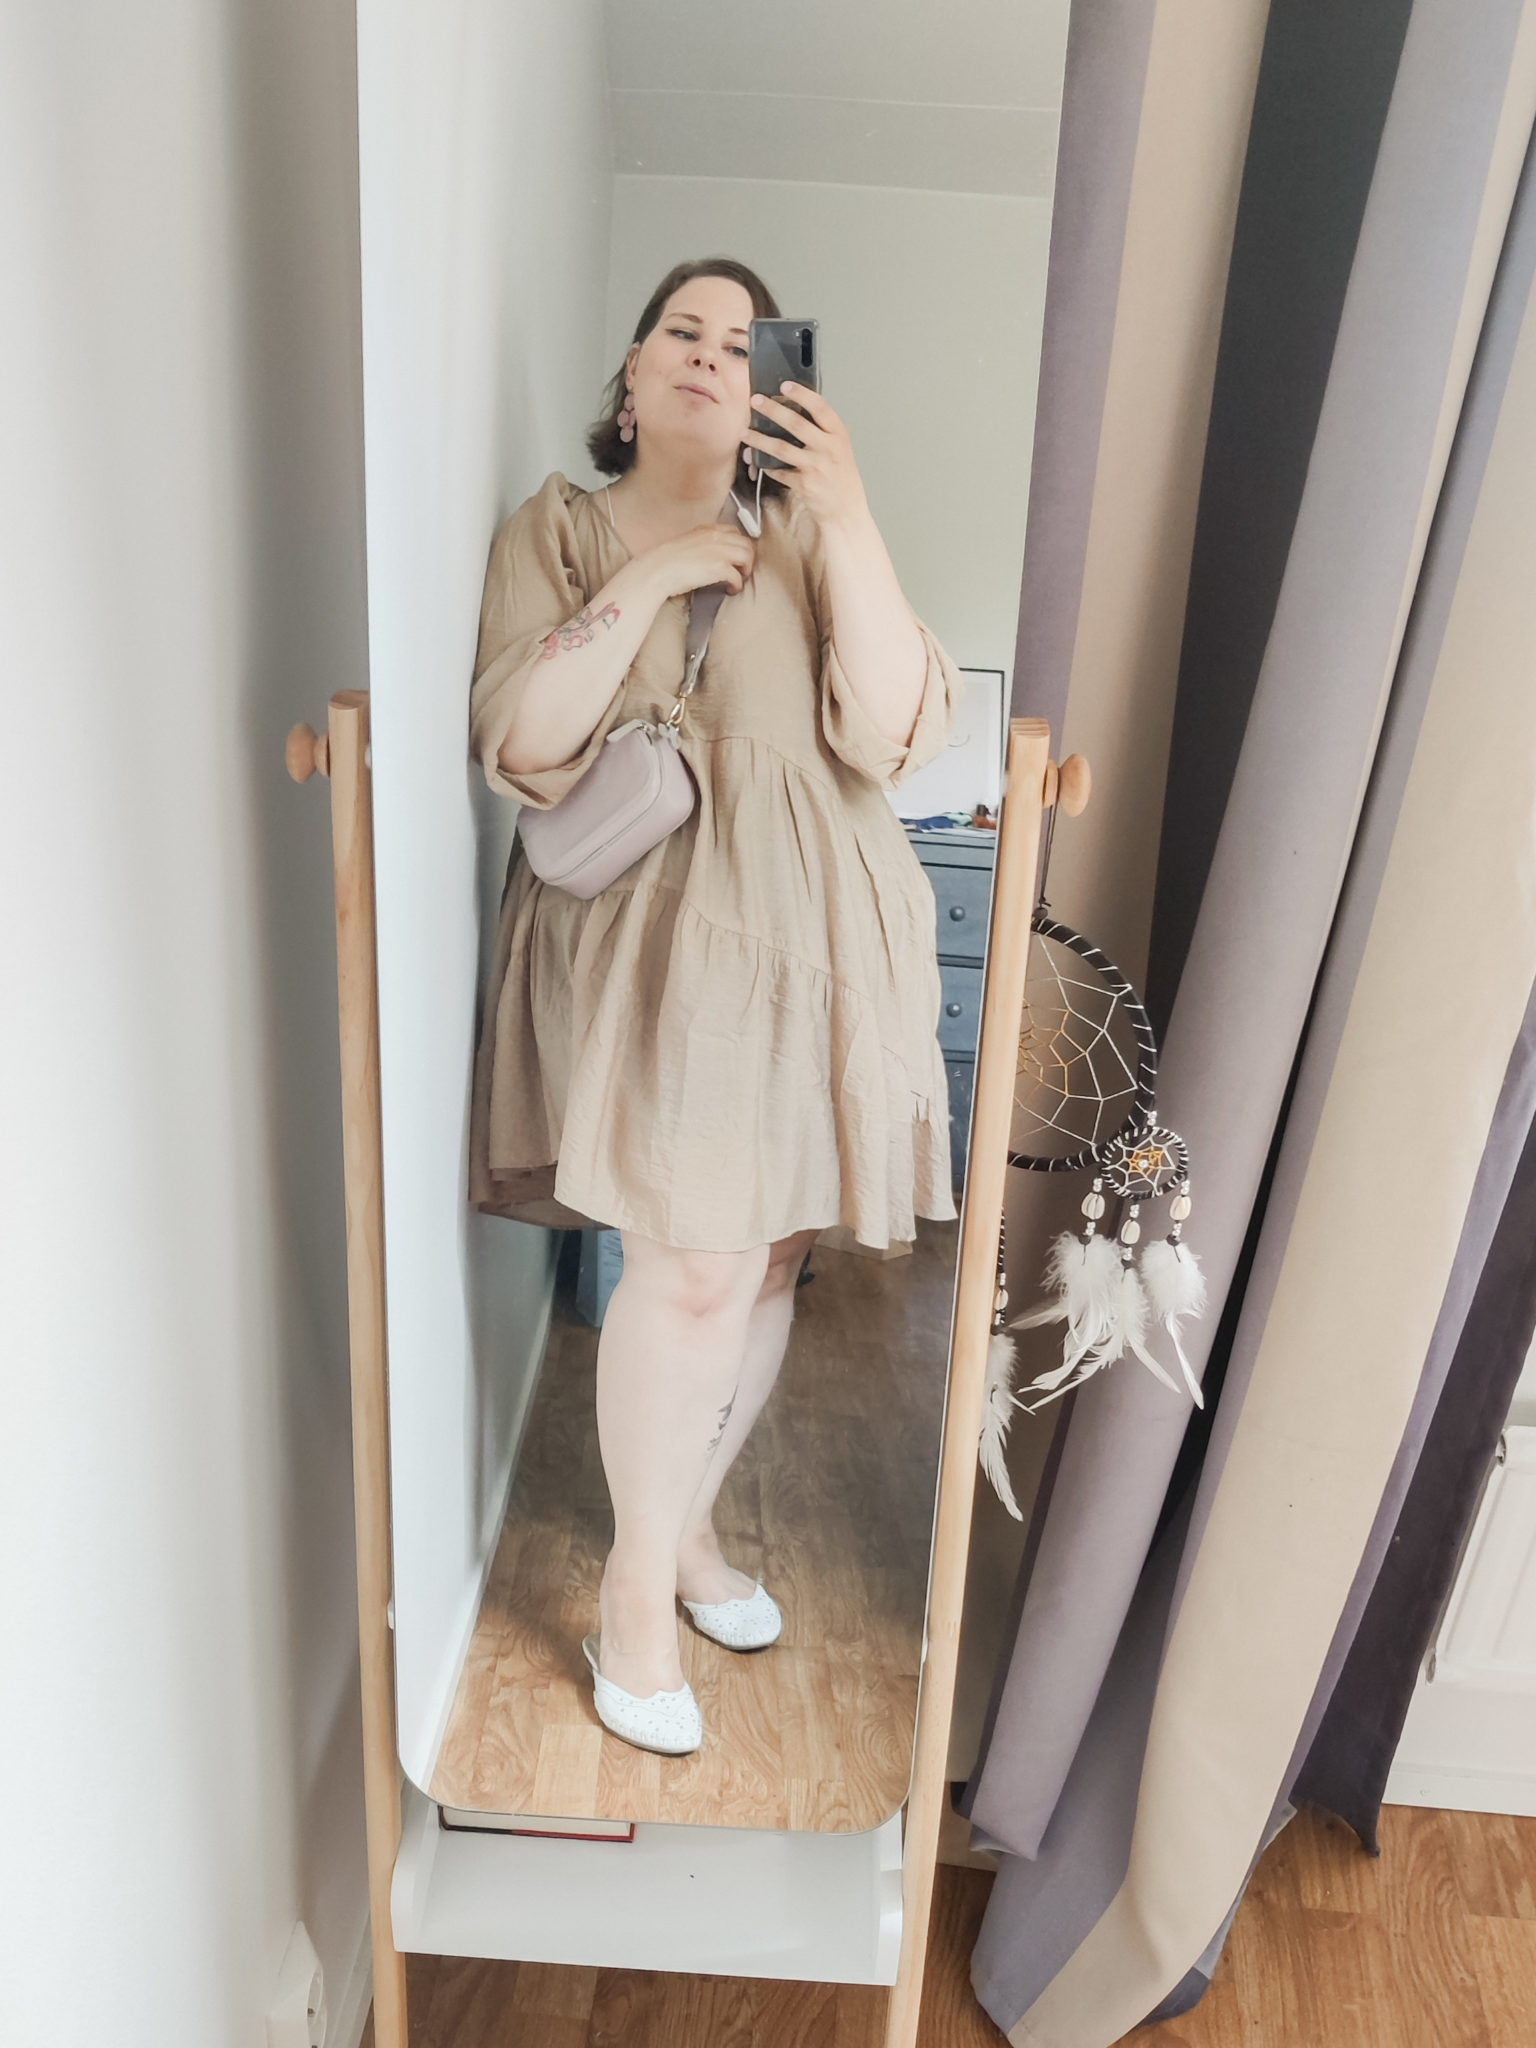 Kesän asut - Kesä muoti - BMH - Big mamas home by Jenni